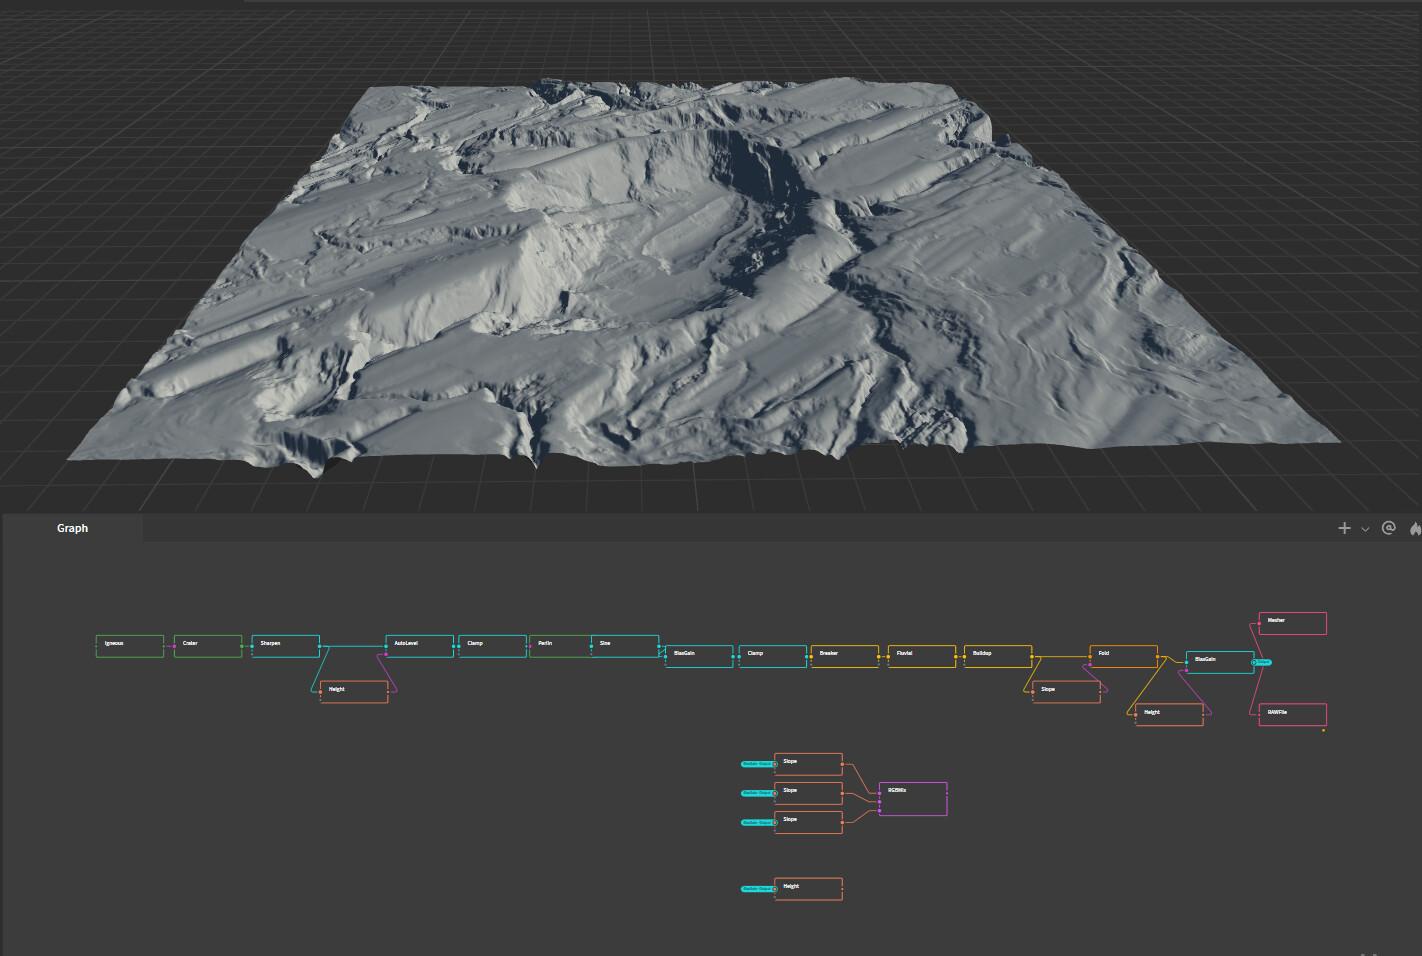 Used Gaea to generate terrain landscape